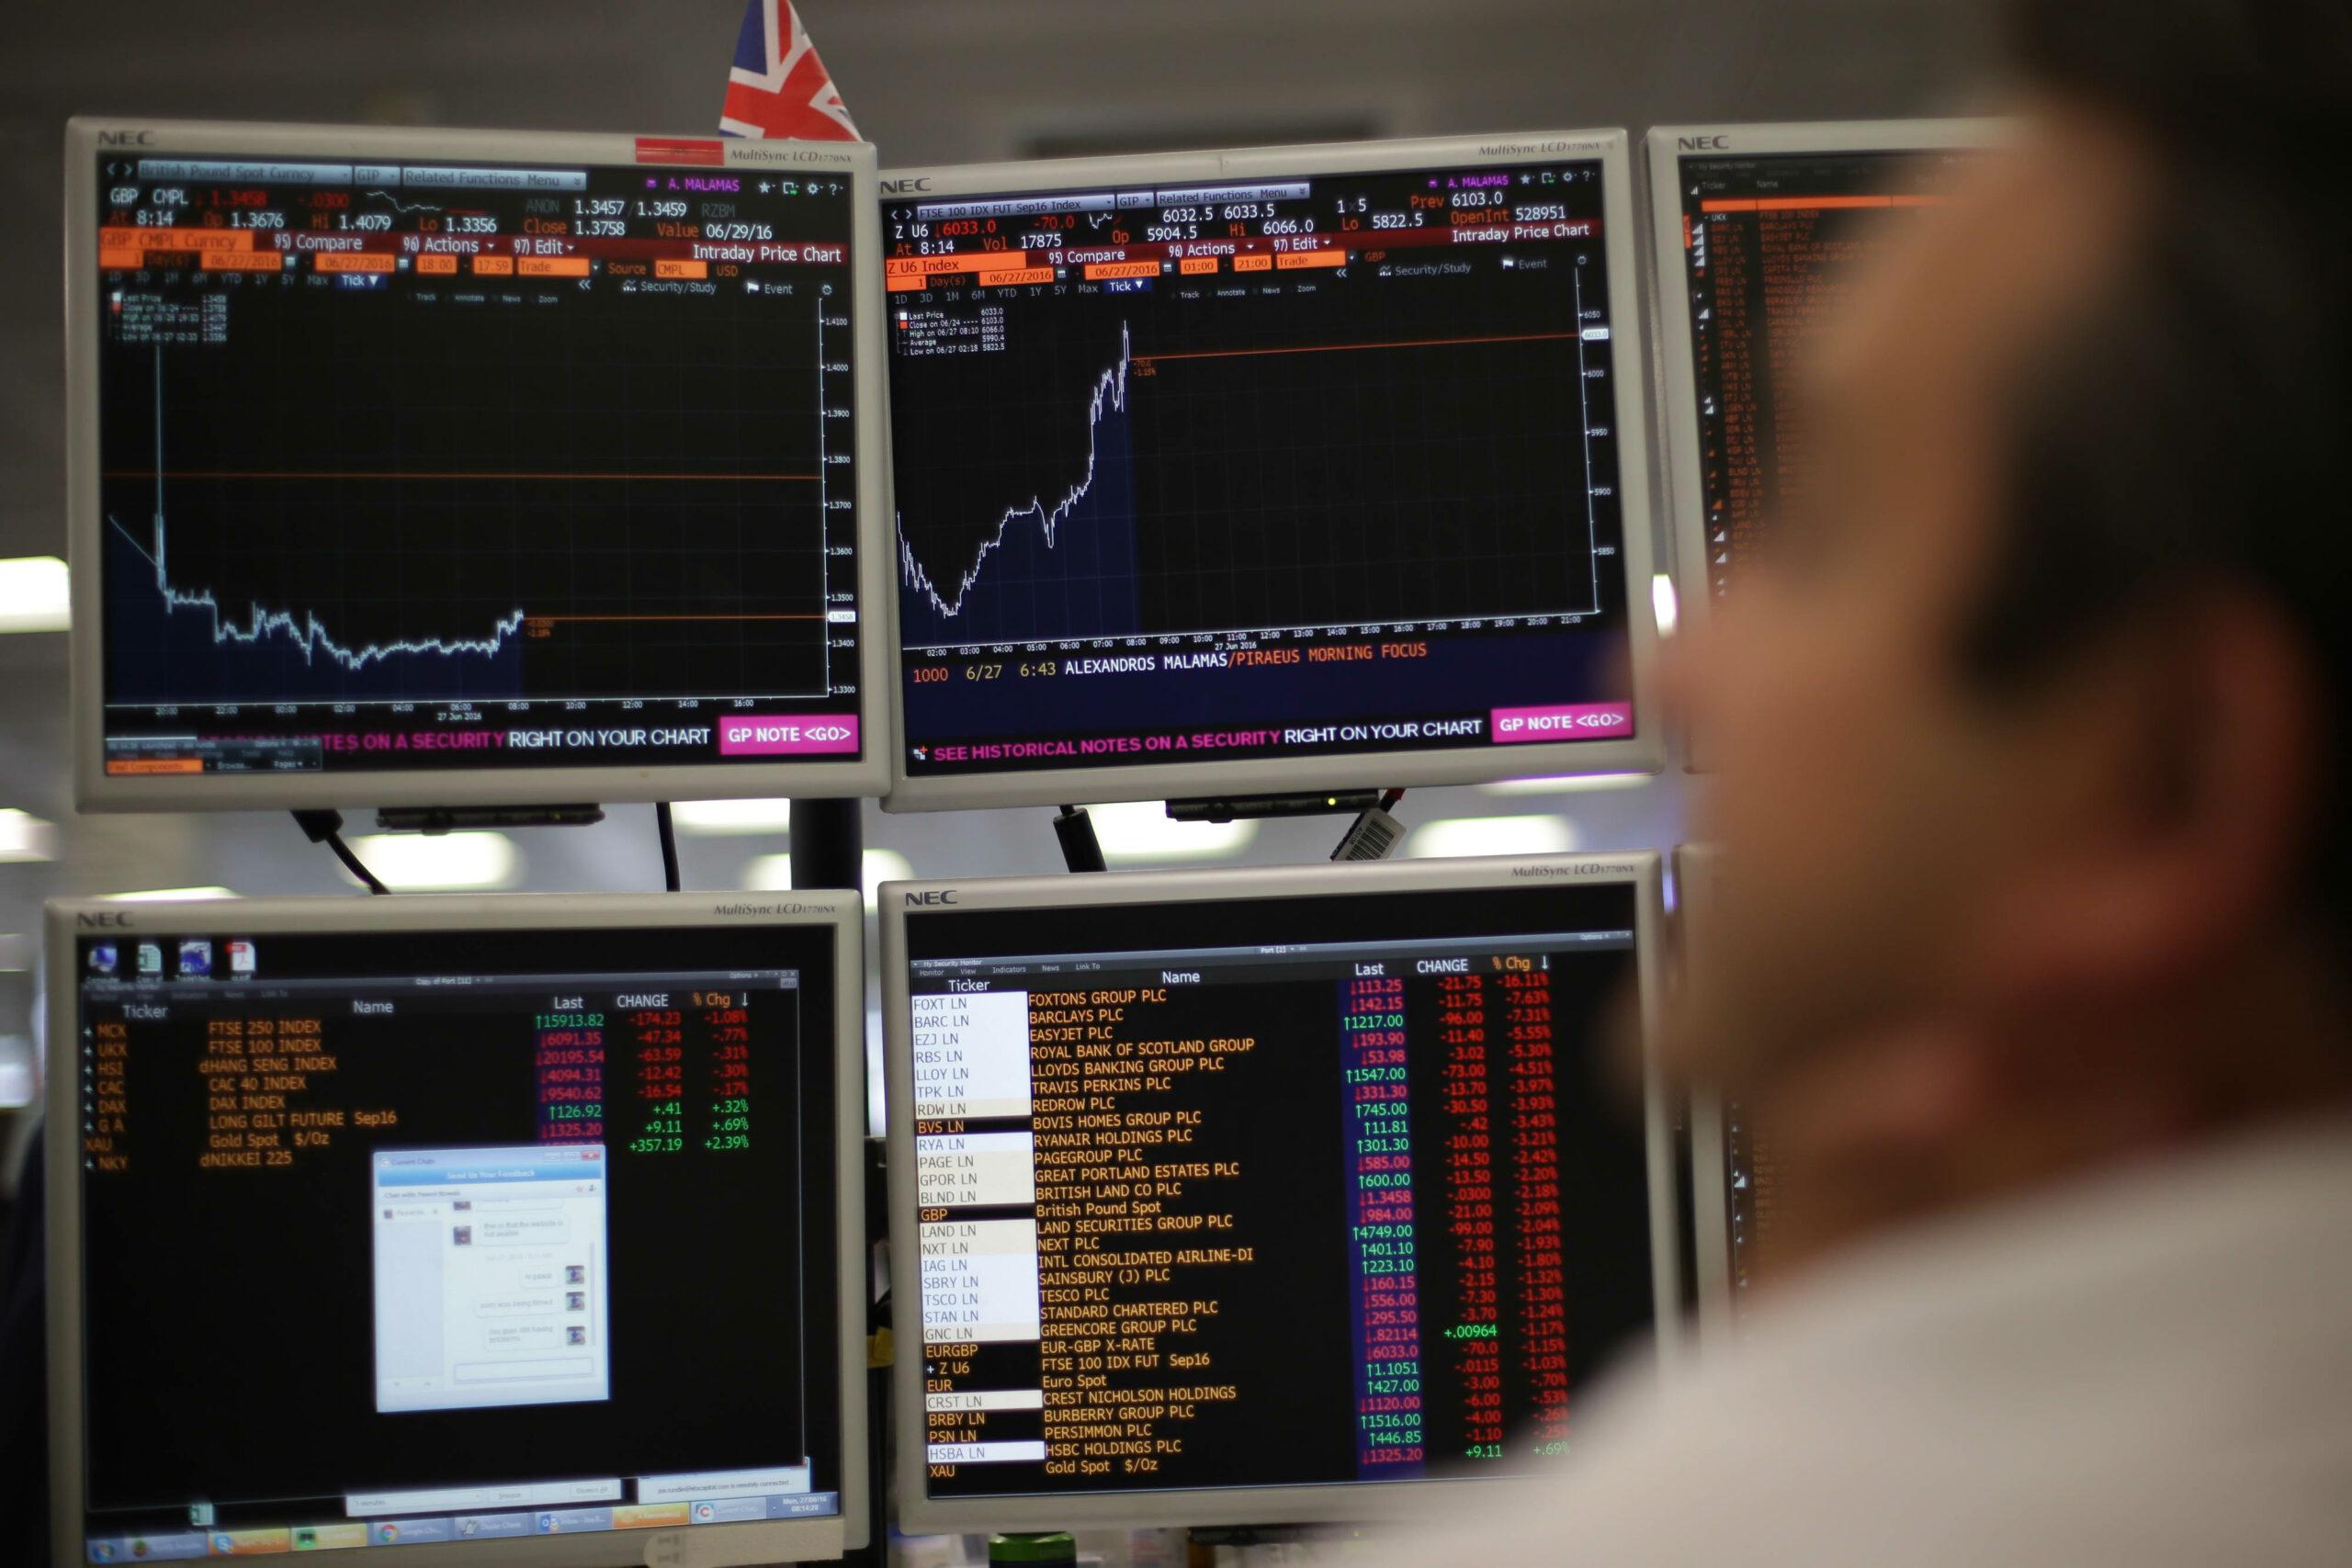 European markets close mixed after a choppy week; miners gain